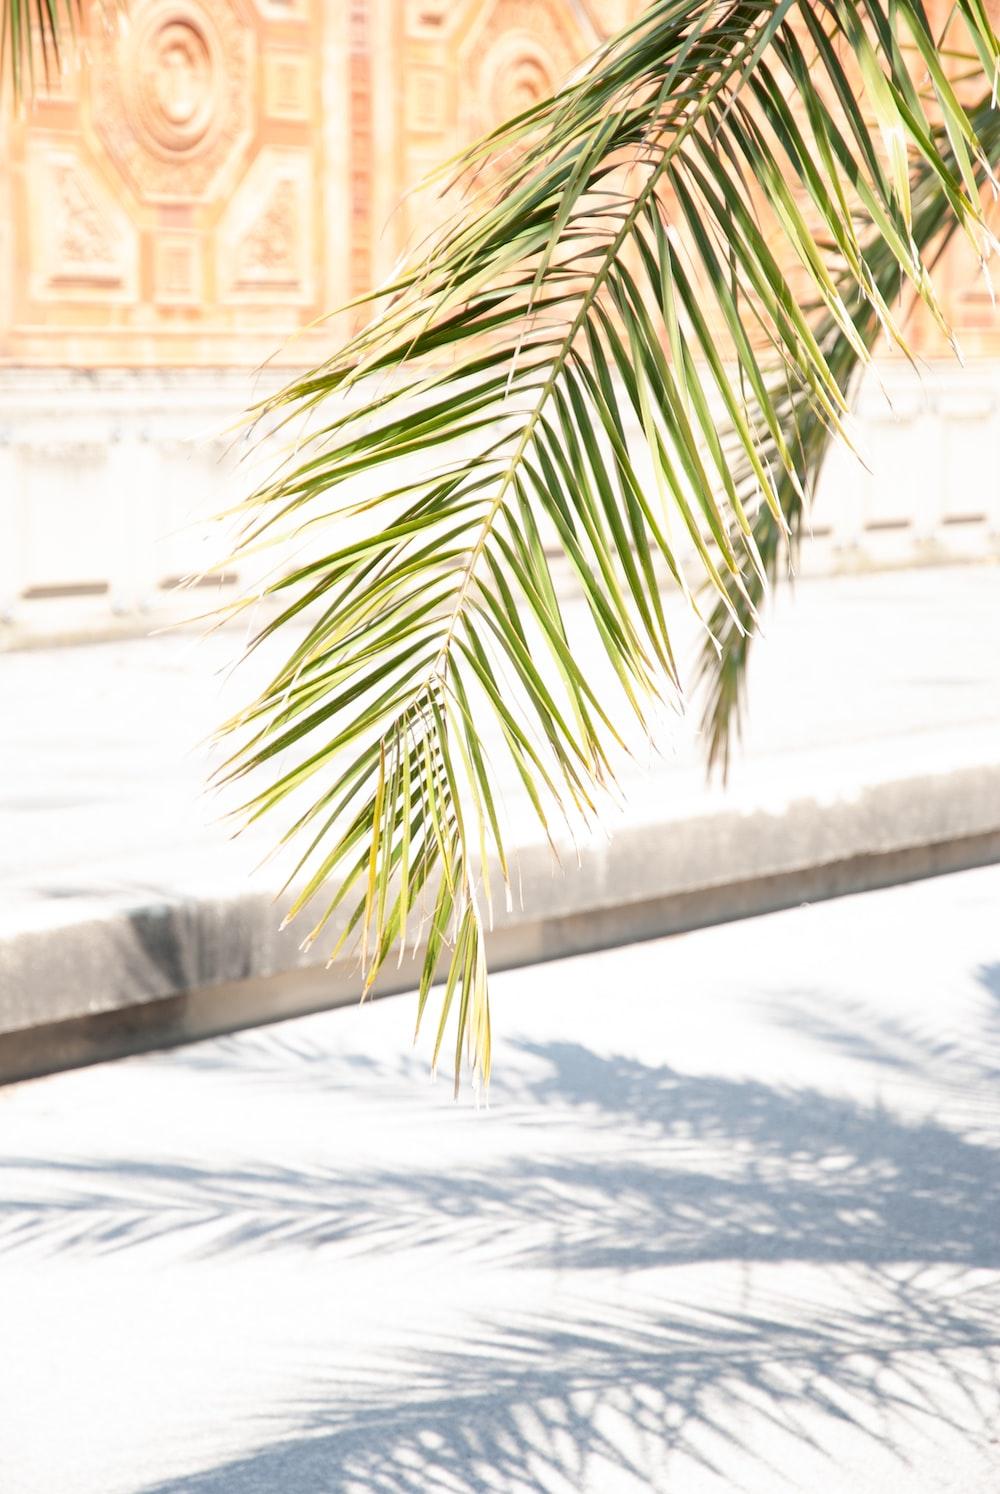 green palm leaves near pavement